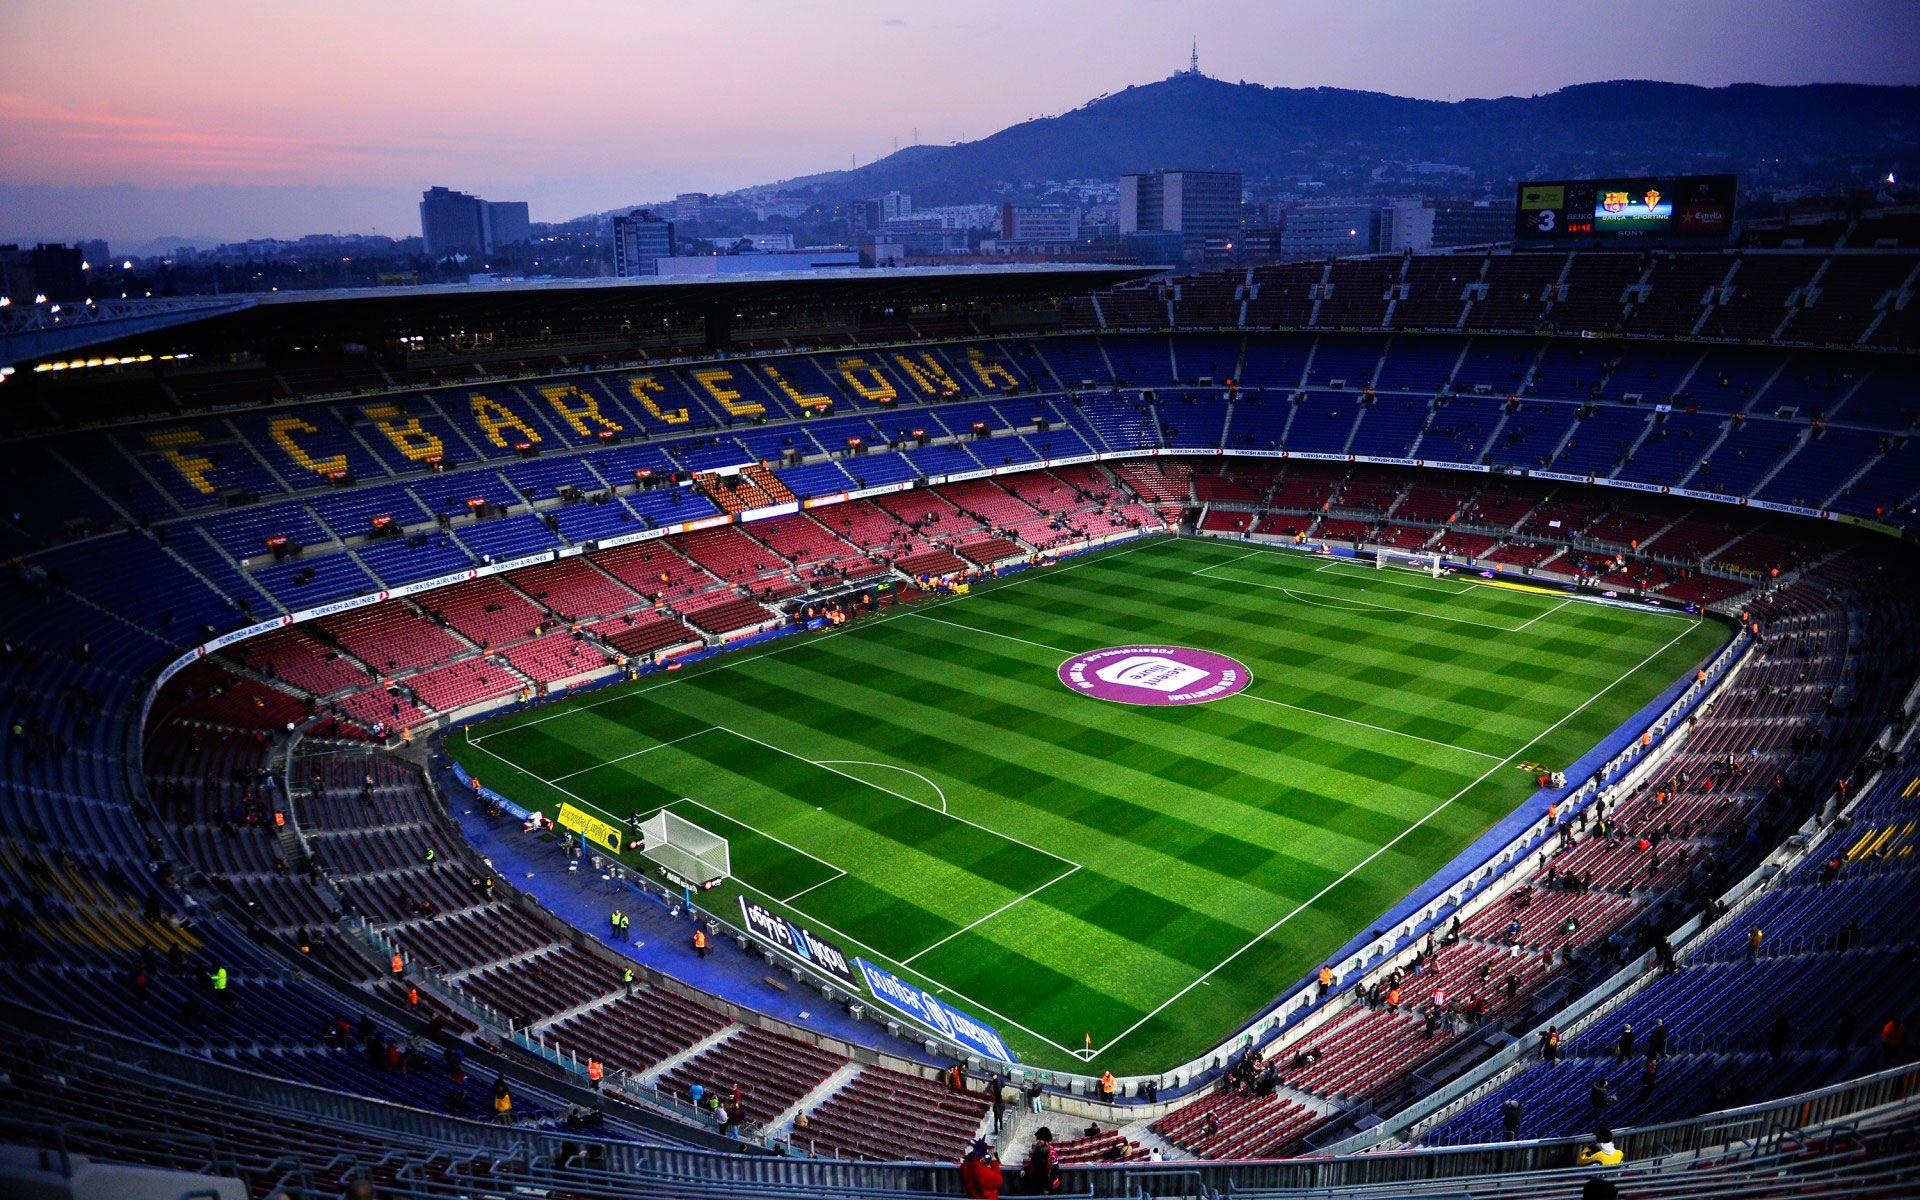 Fondos De Pantalla Camp Nou España El Fc Barcelona: Стадион Камп Ноу (Camp Nou